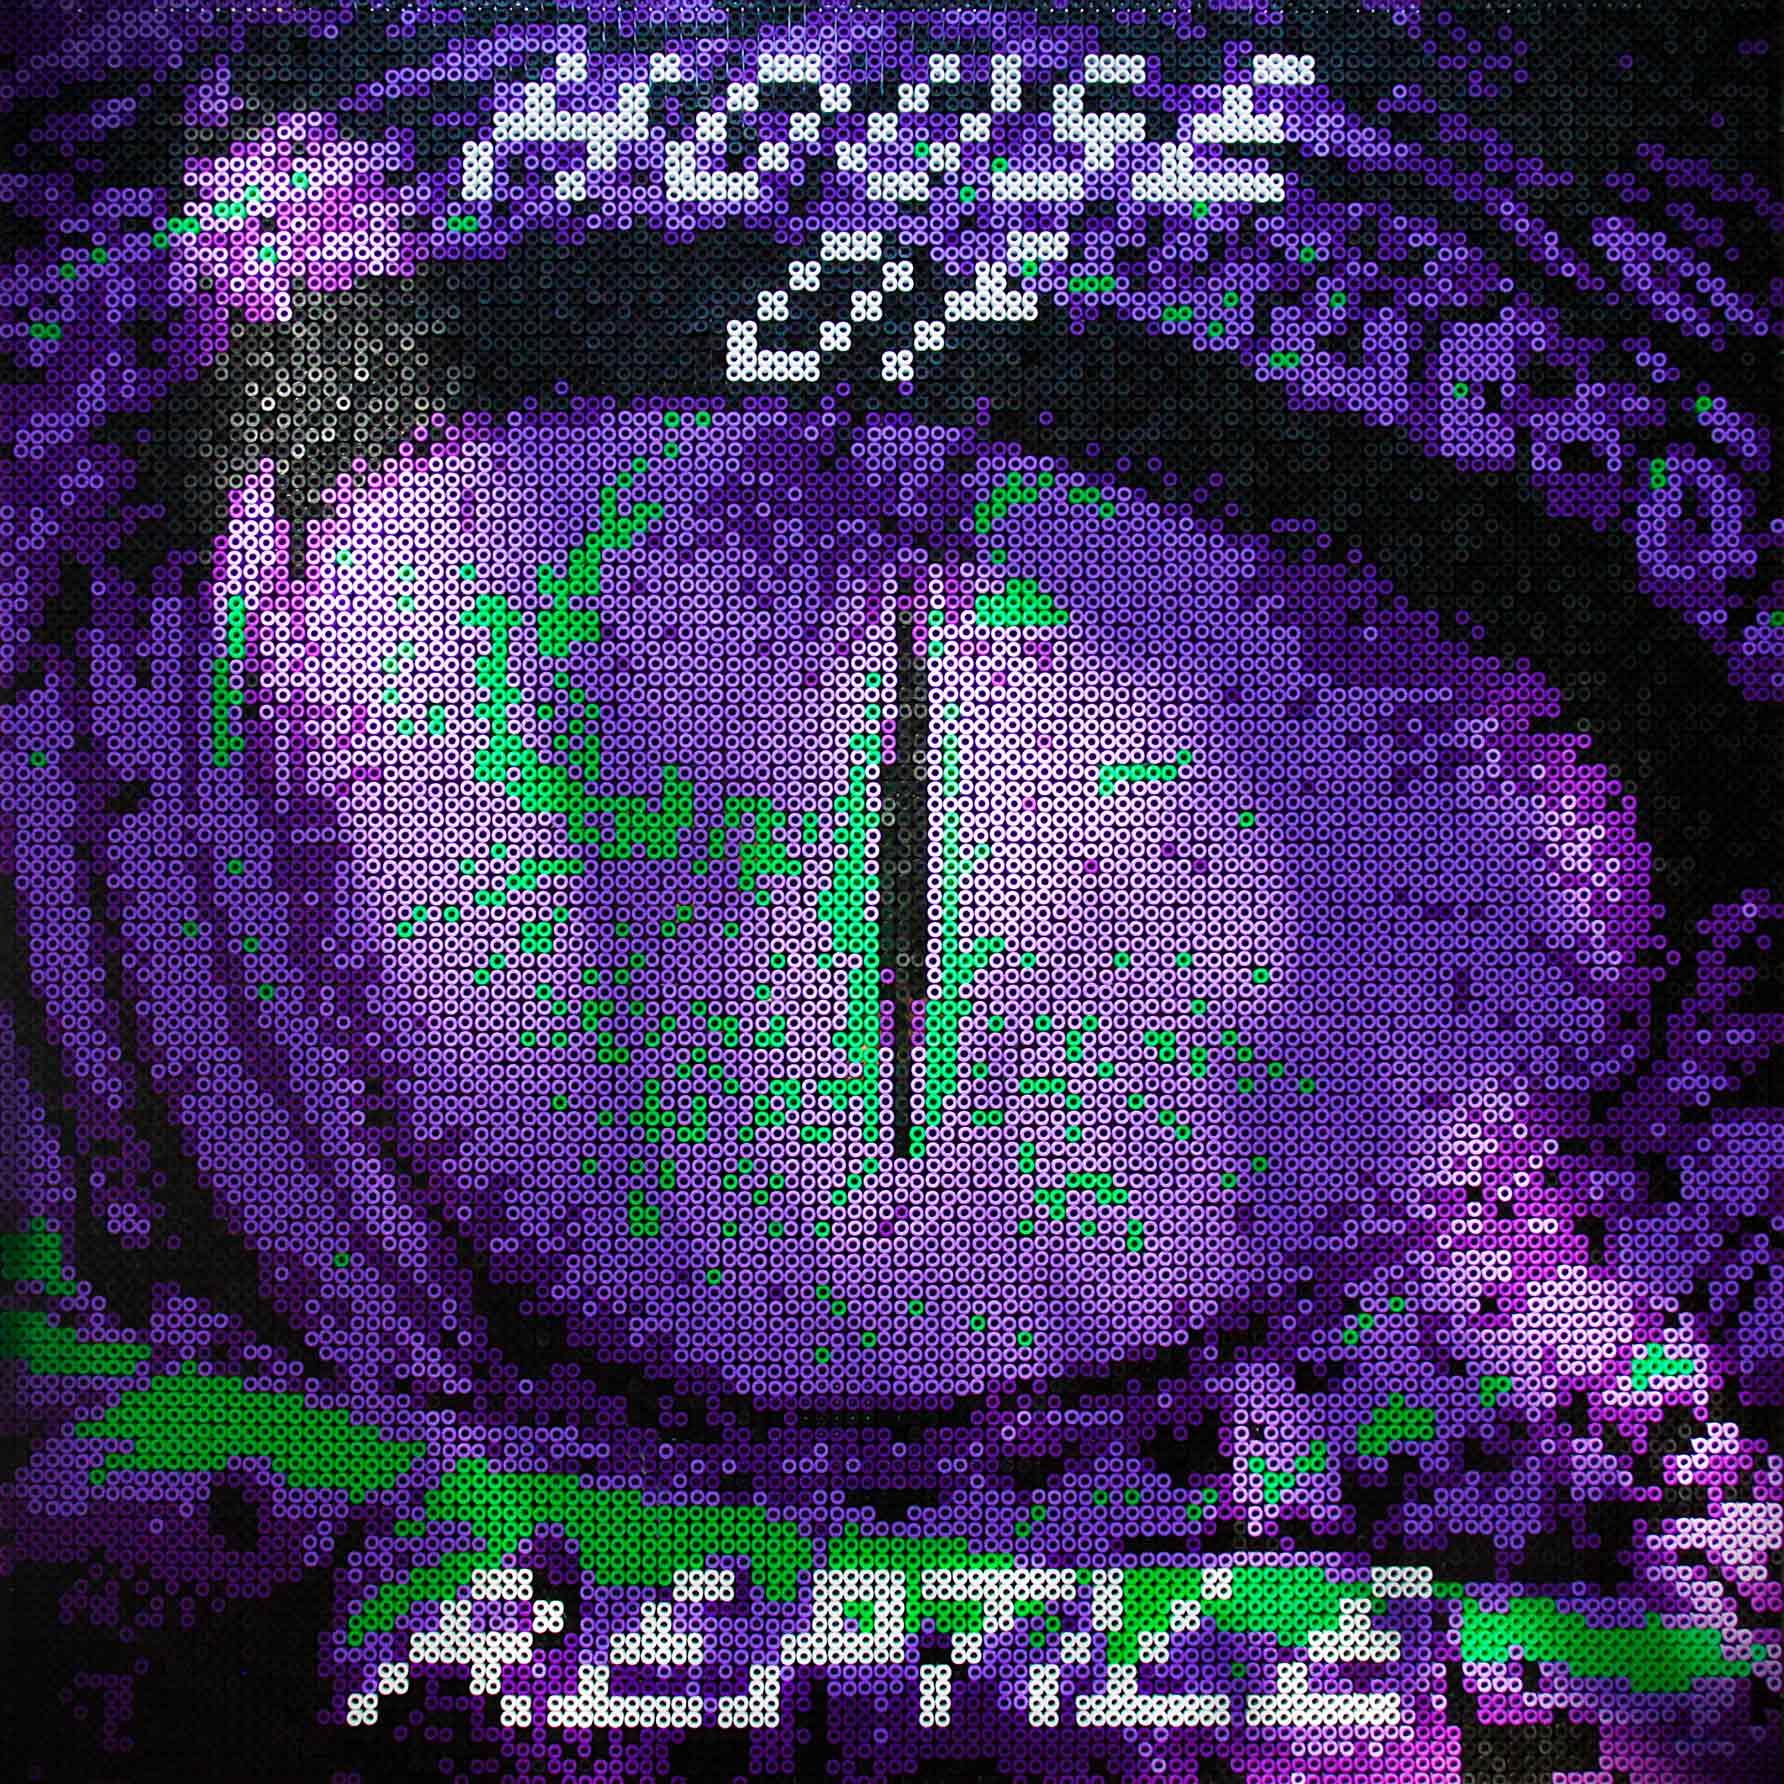 House of Reptile - EP1 - Album Cover